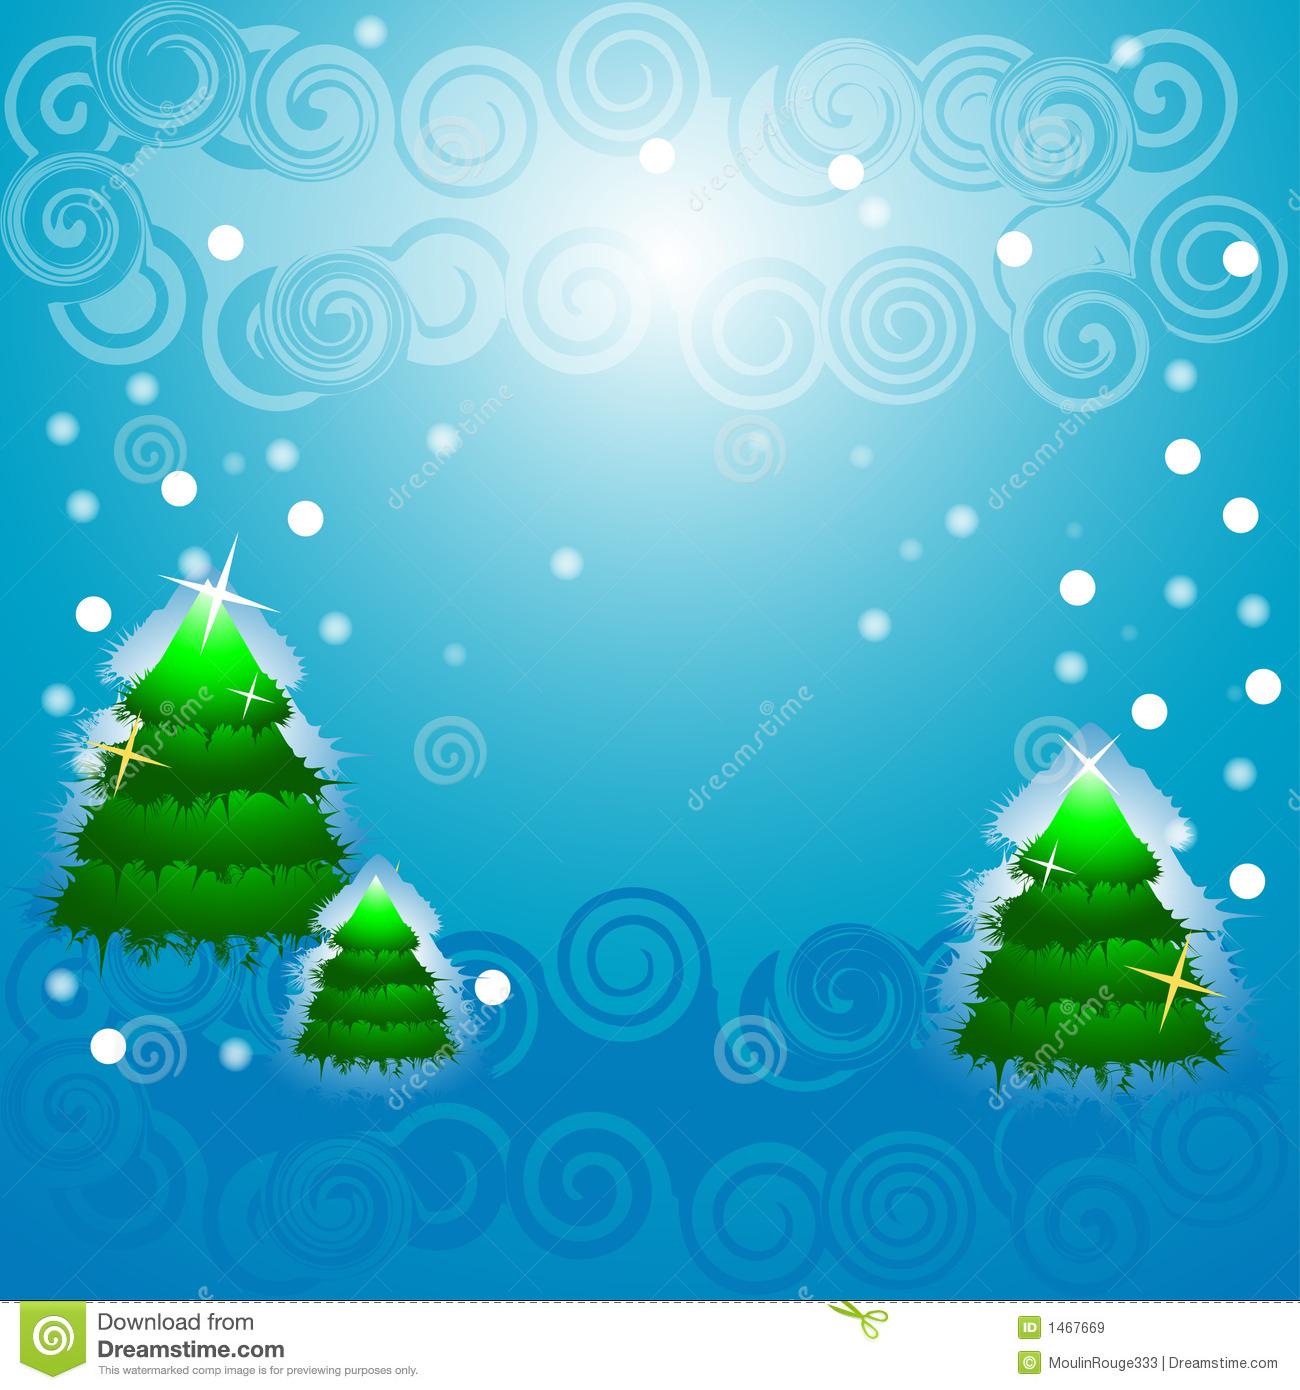 Clipart flashing christmas tree clipart royalty free download Blinking Christmas Tree Clipart - Clipart Kid clipart royalty free download